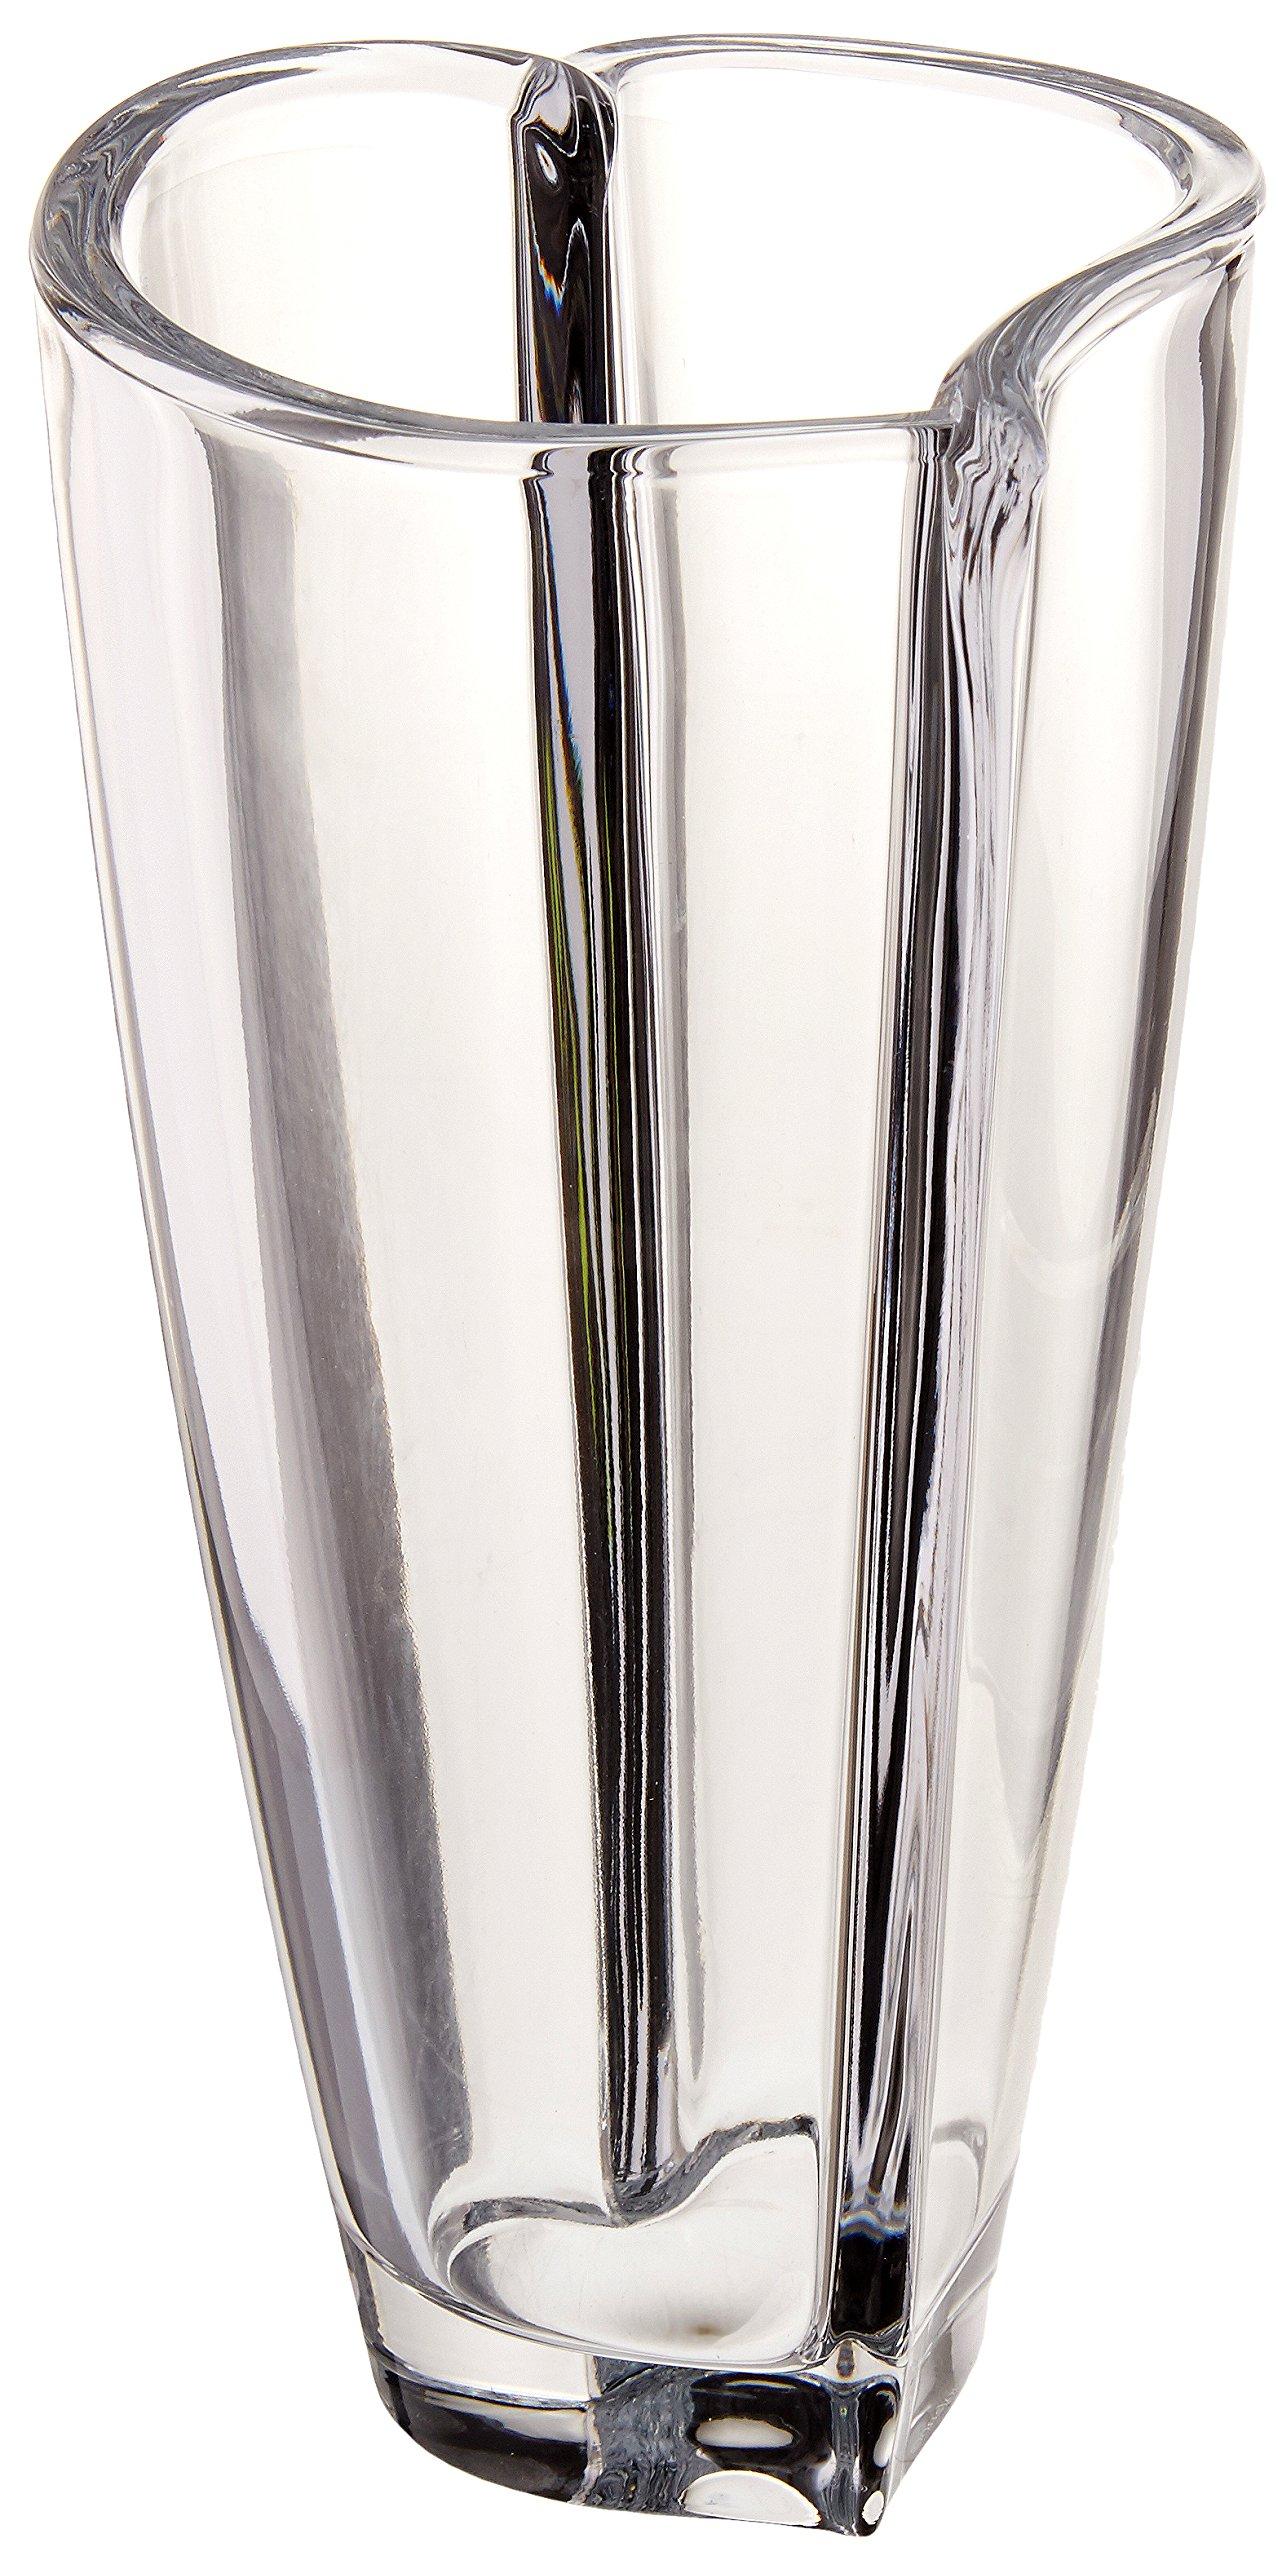 Orrefors Heart Vase, Large by Orrefors